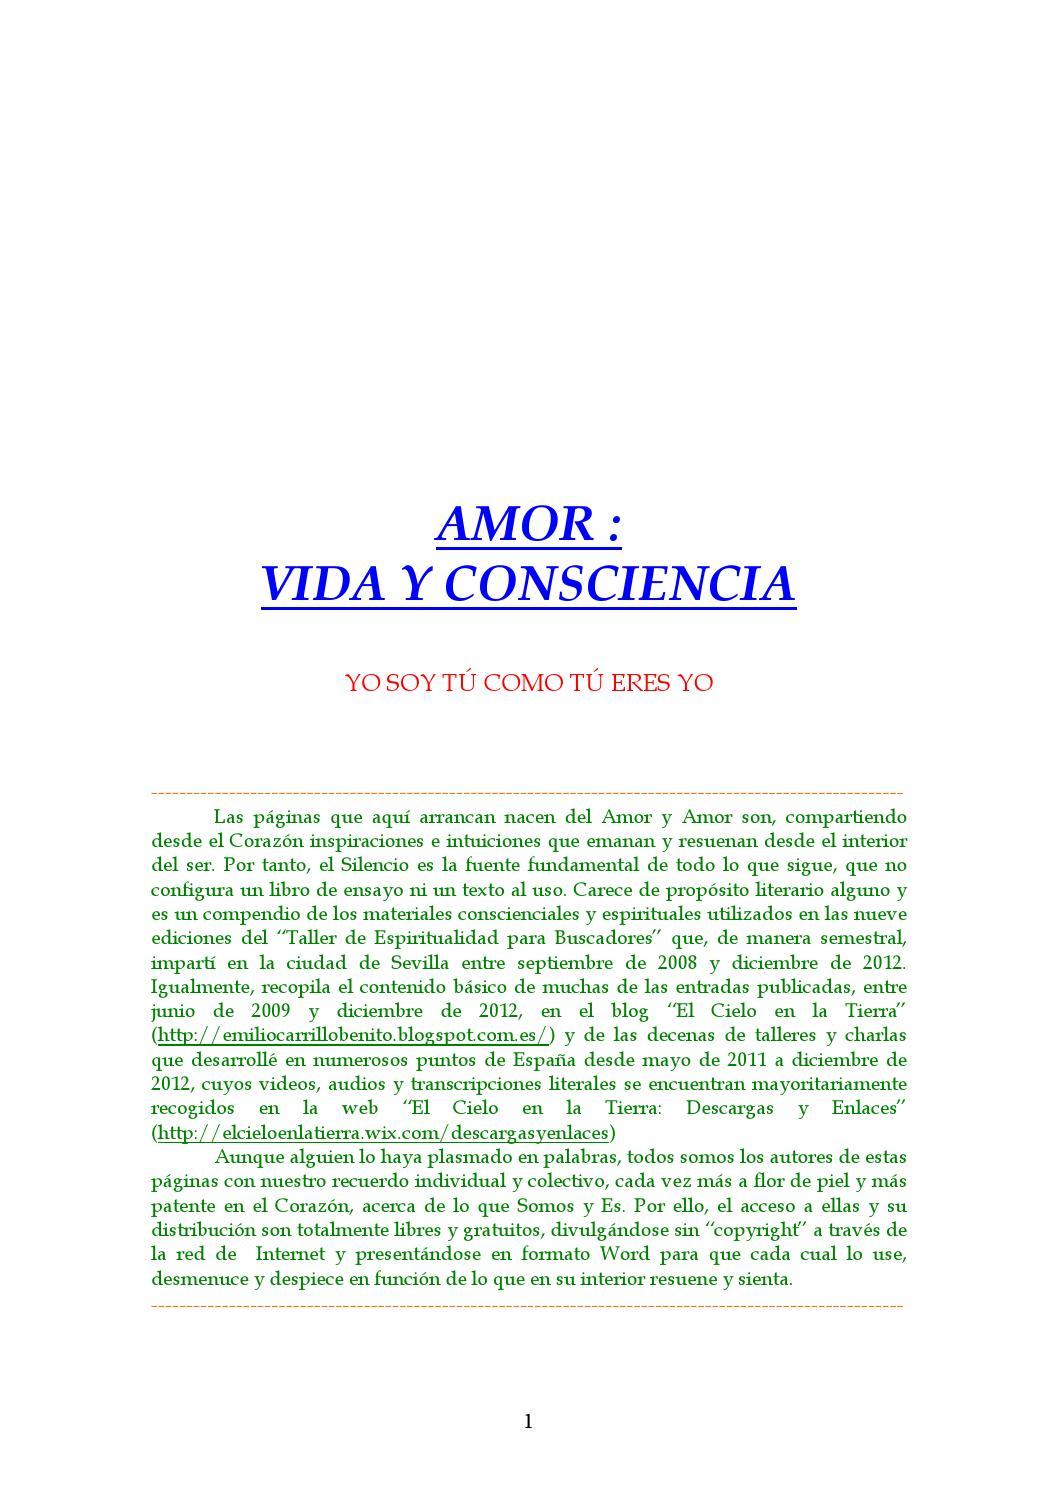 Emilio carrillo amor vida y consciencia by carmen - issuu